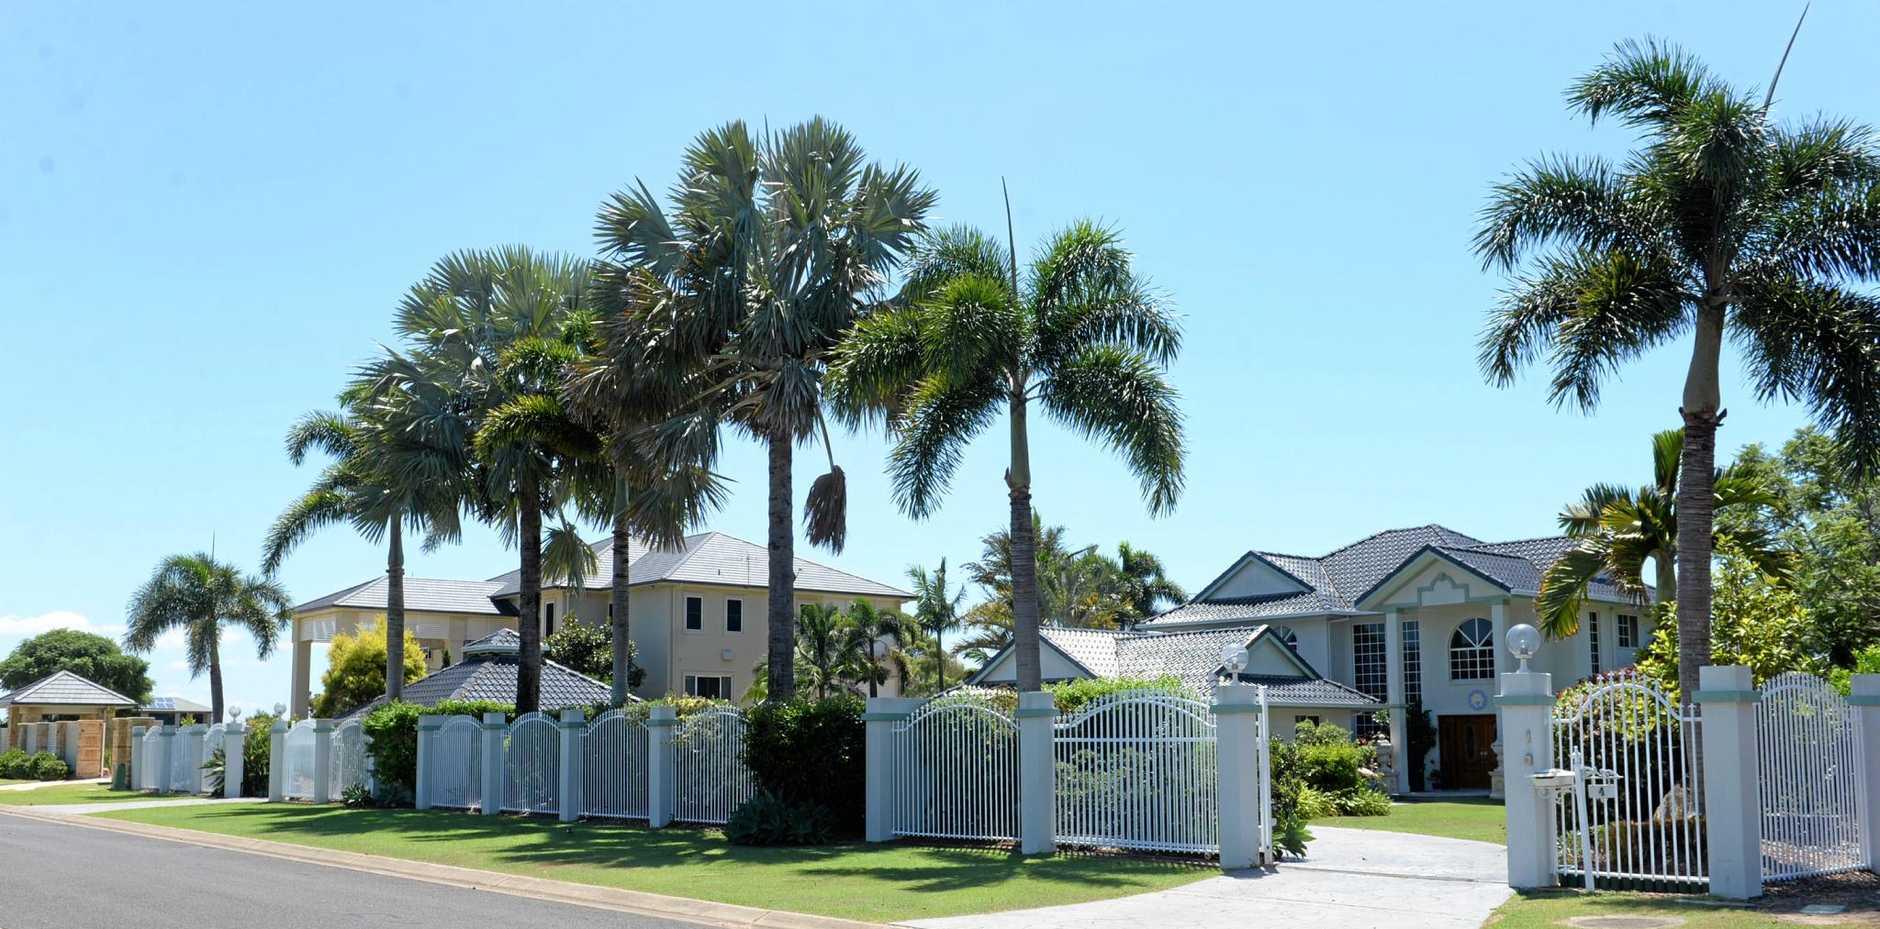 REAL ESTATE: Real estate in Bundaberg is moving ahead.